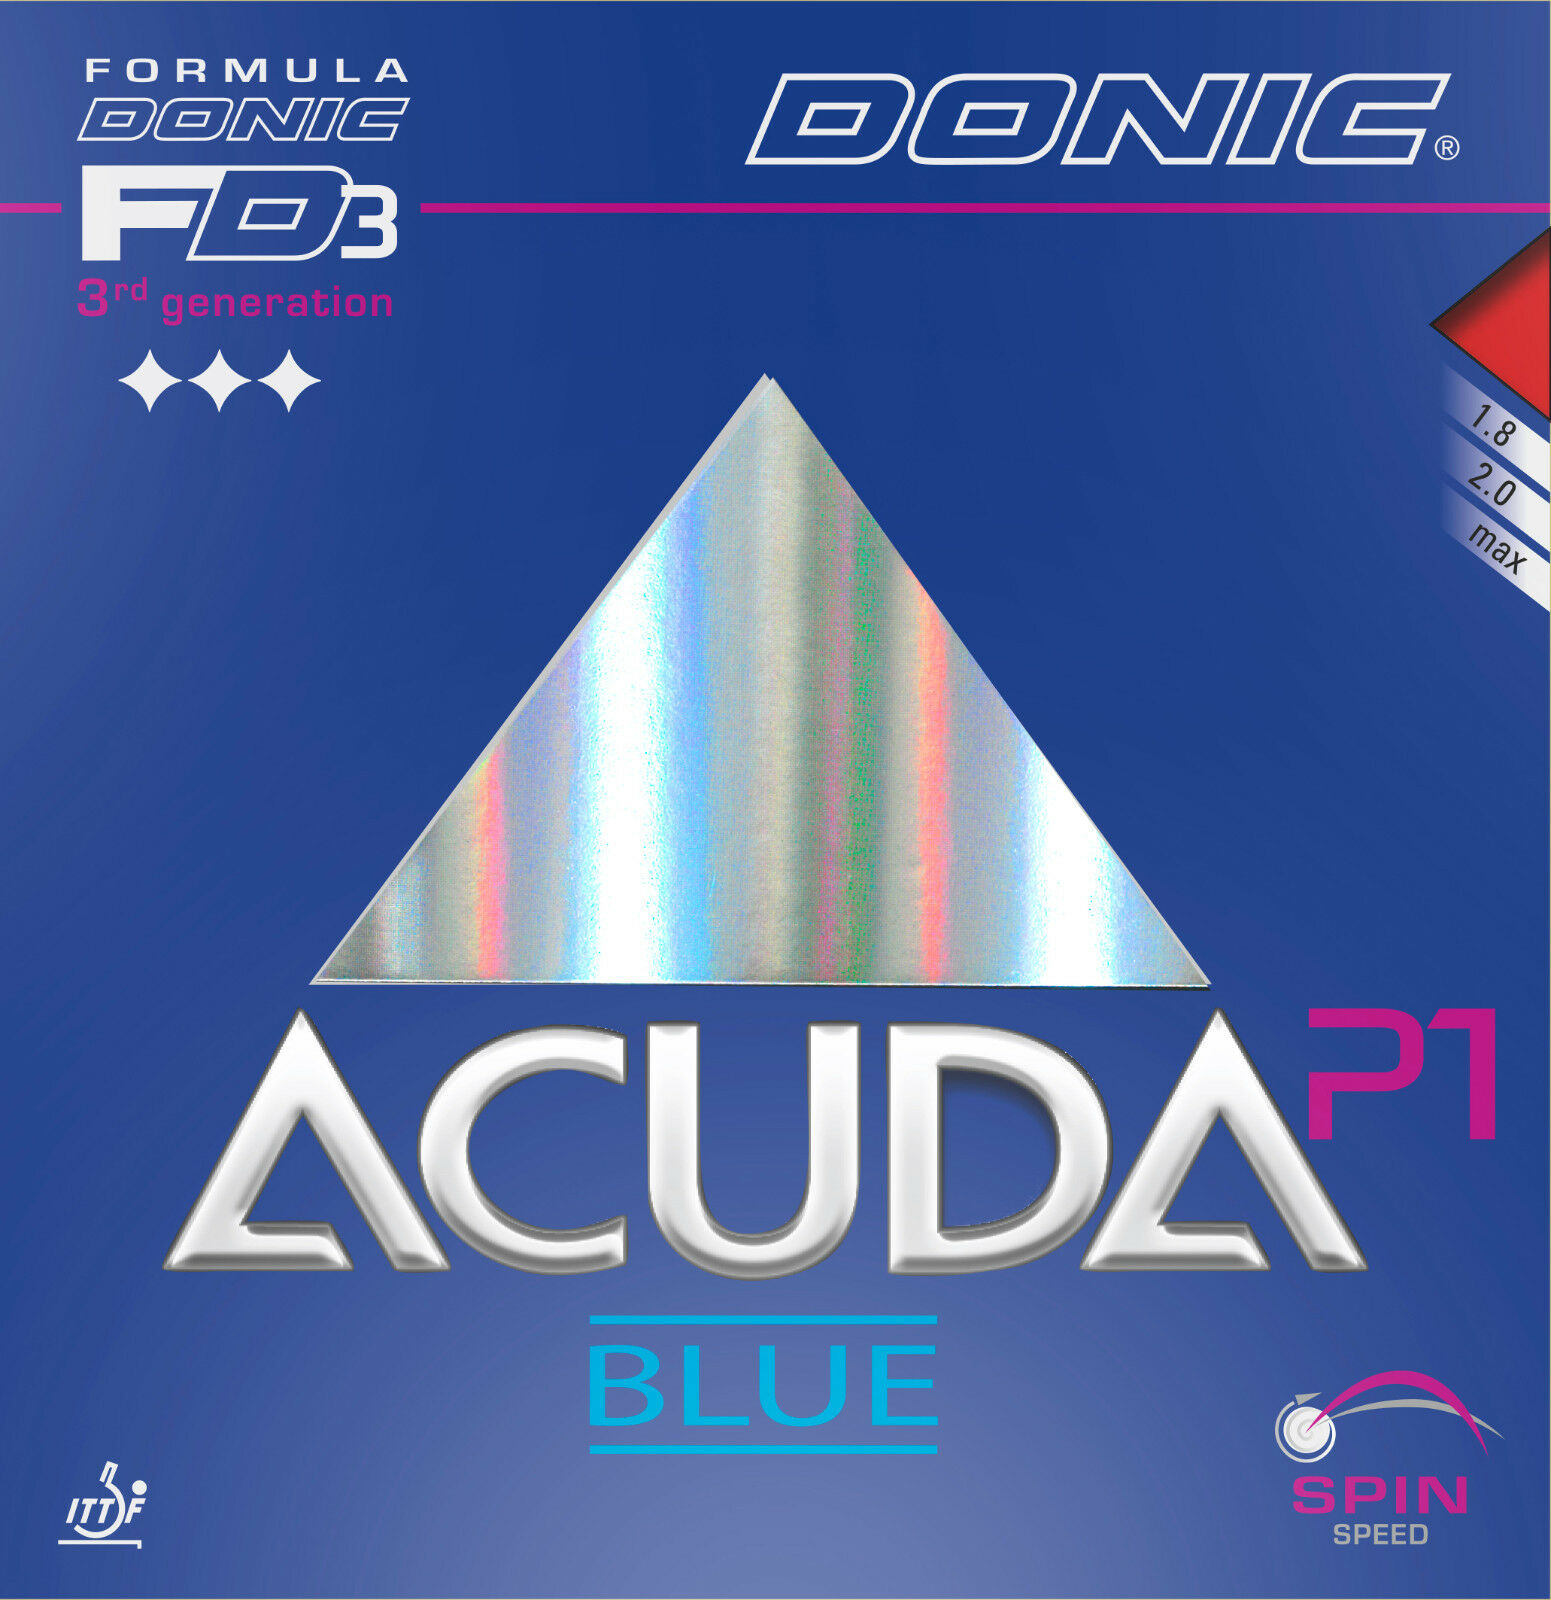 DONIC Acuda Blau P1 max schwarz    NEU   OVP 3e869b